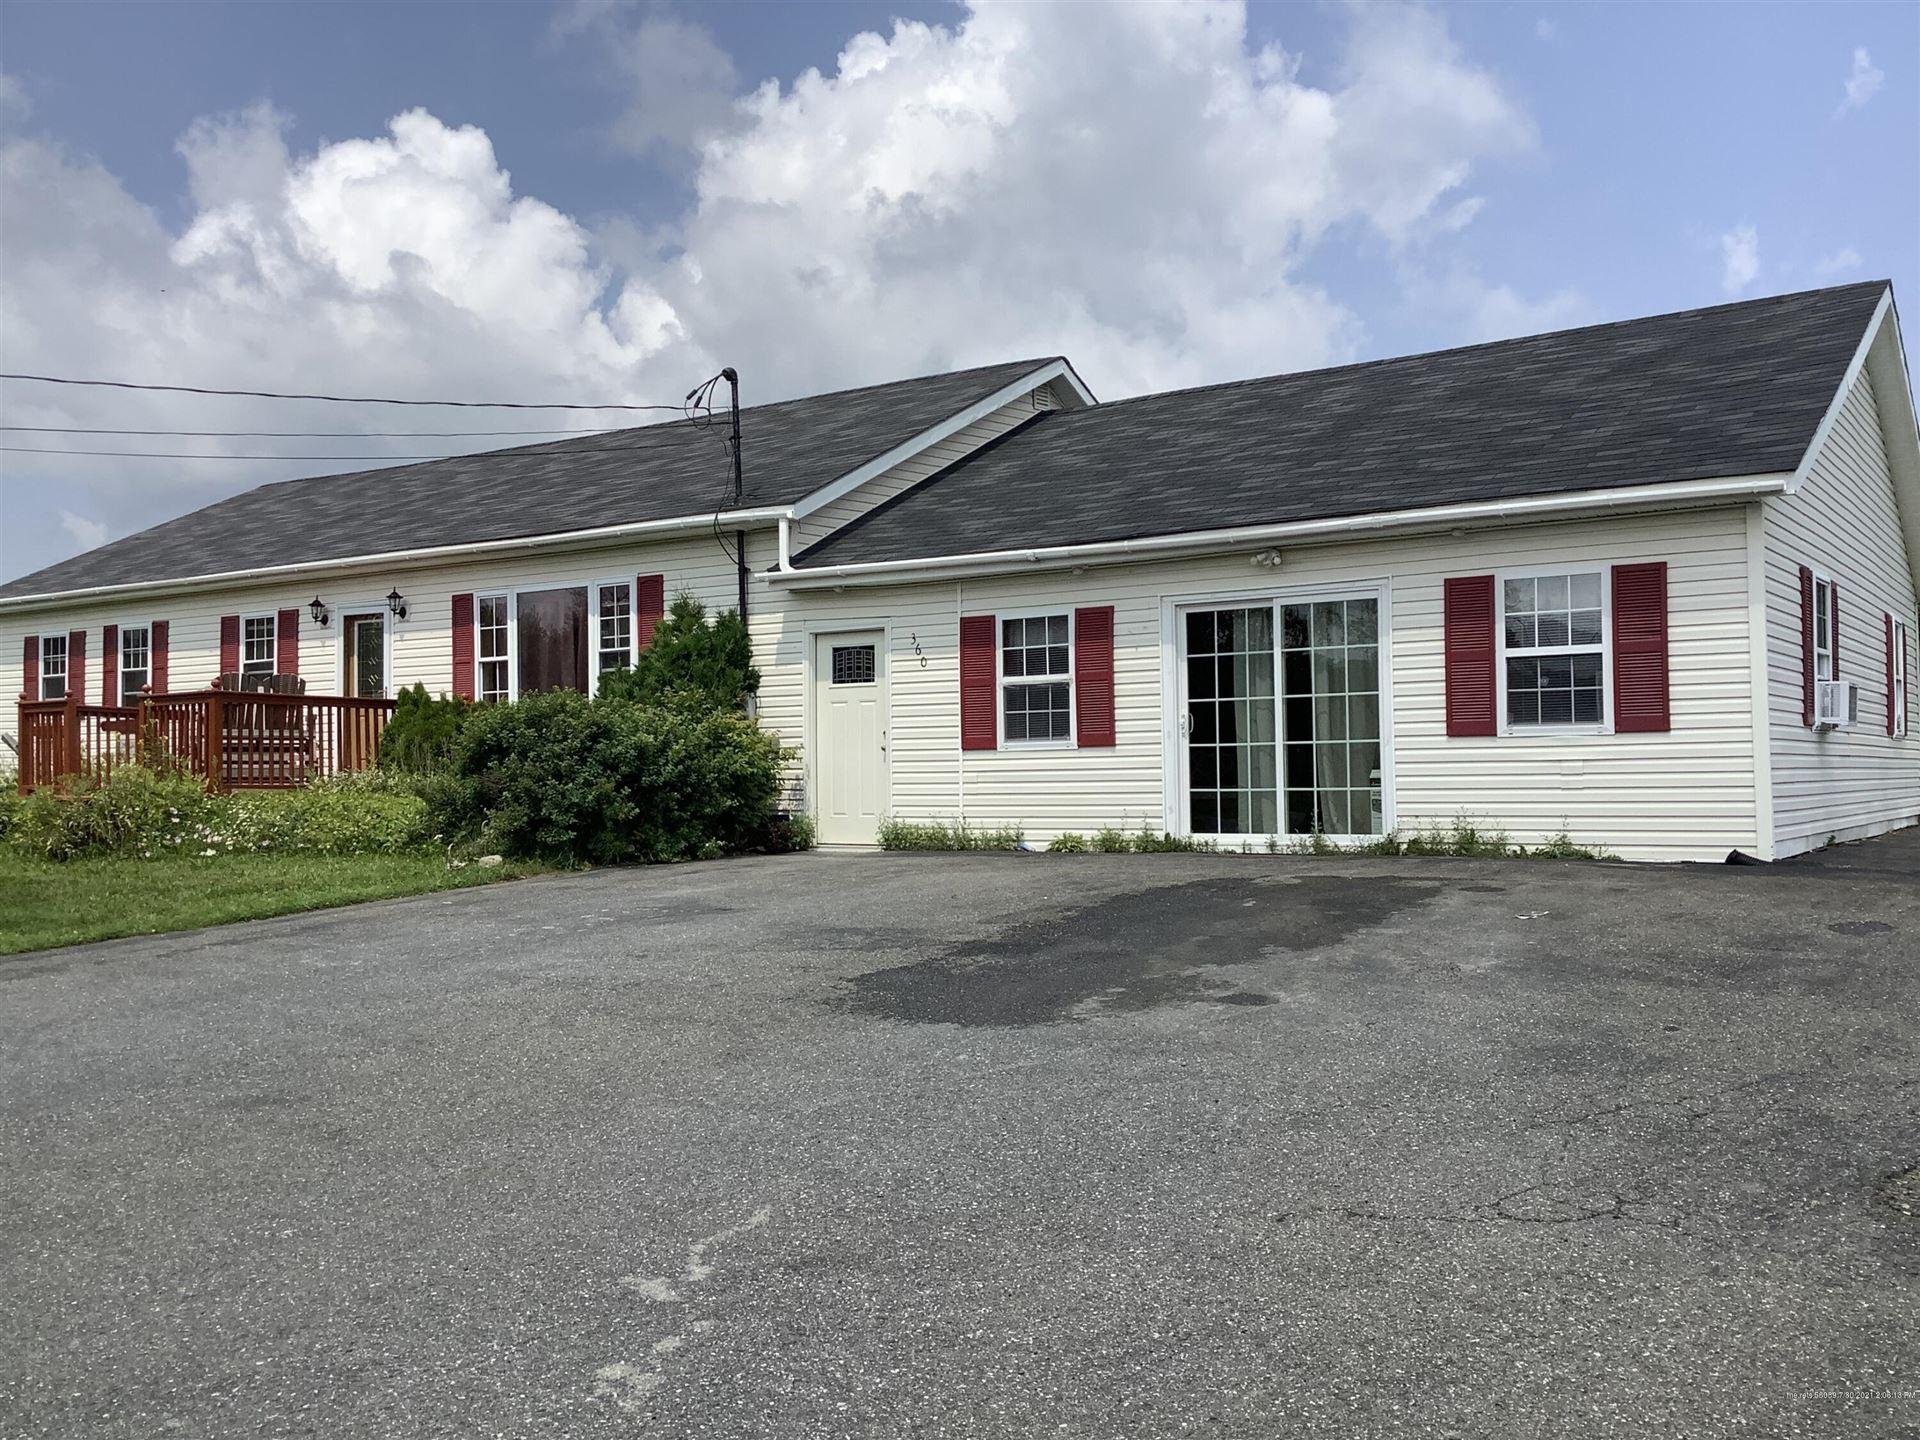 Photo of 360 Presque Isle Road, Ashland, ME 04732 (MLS # 1502958)